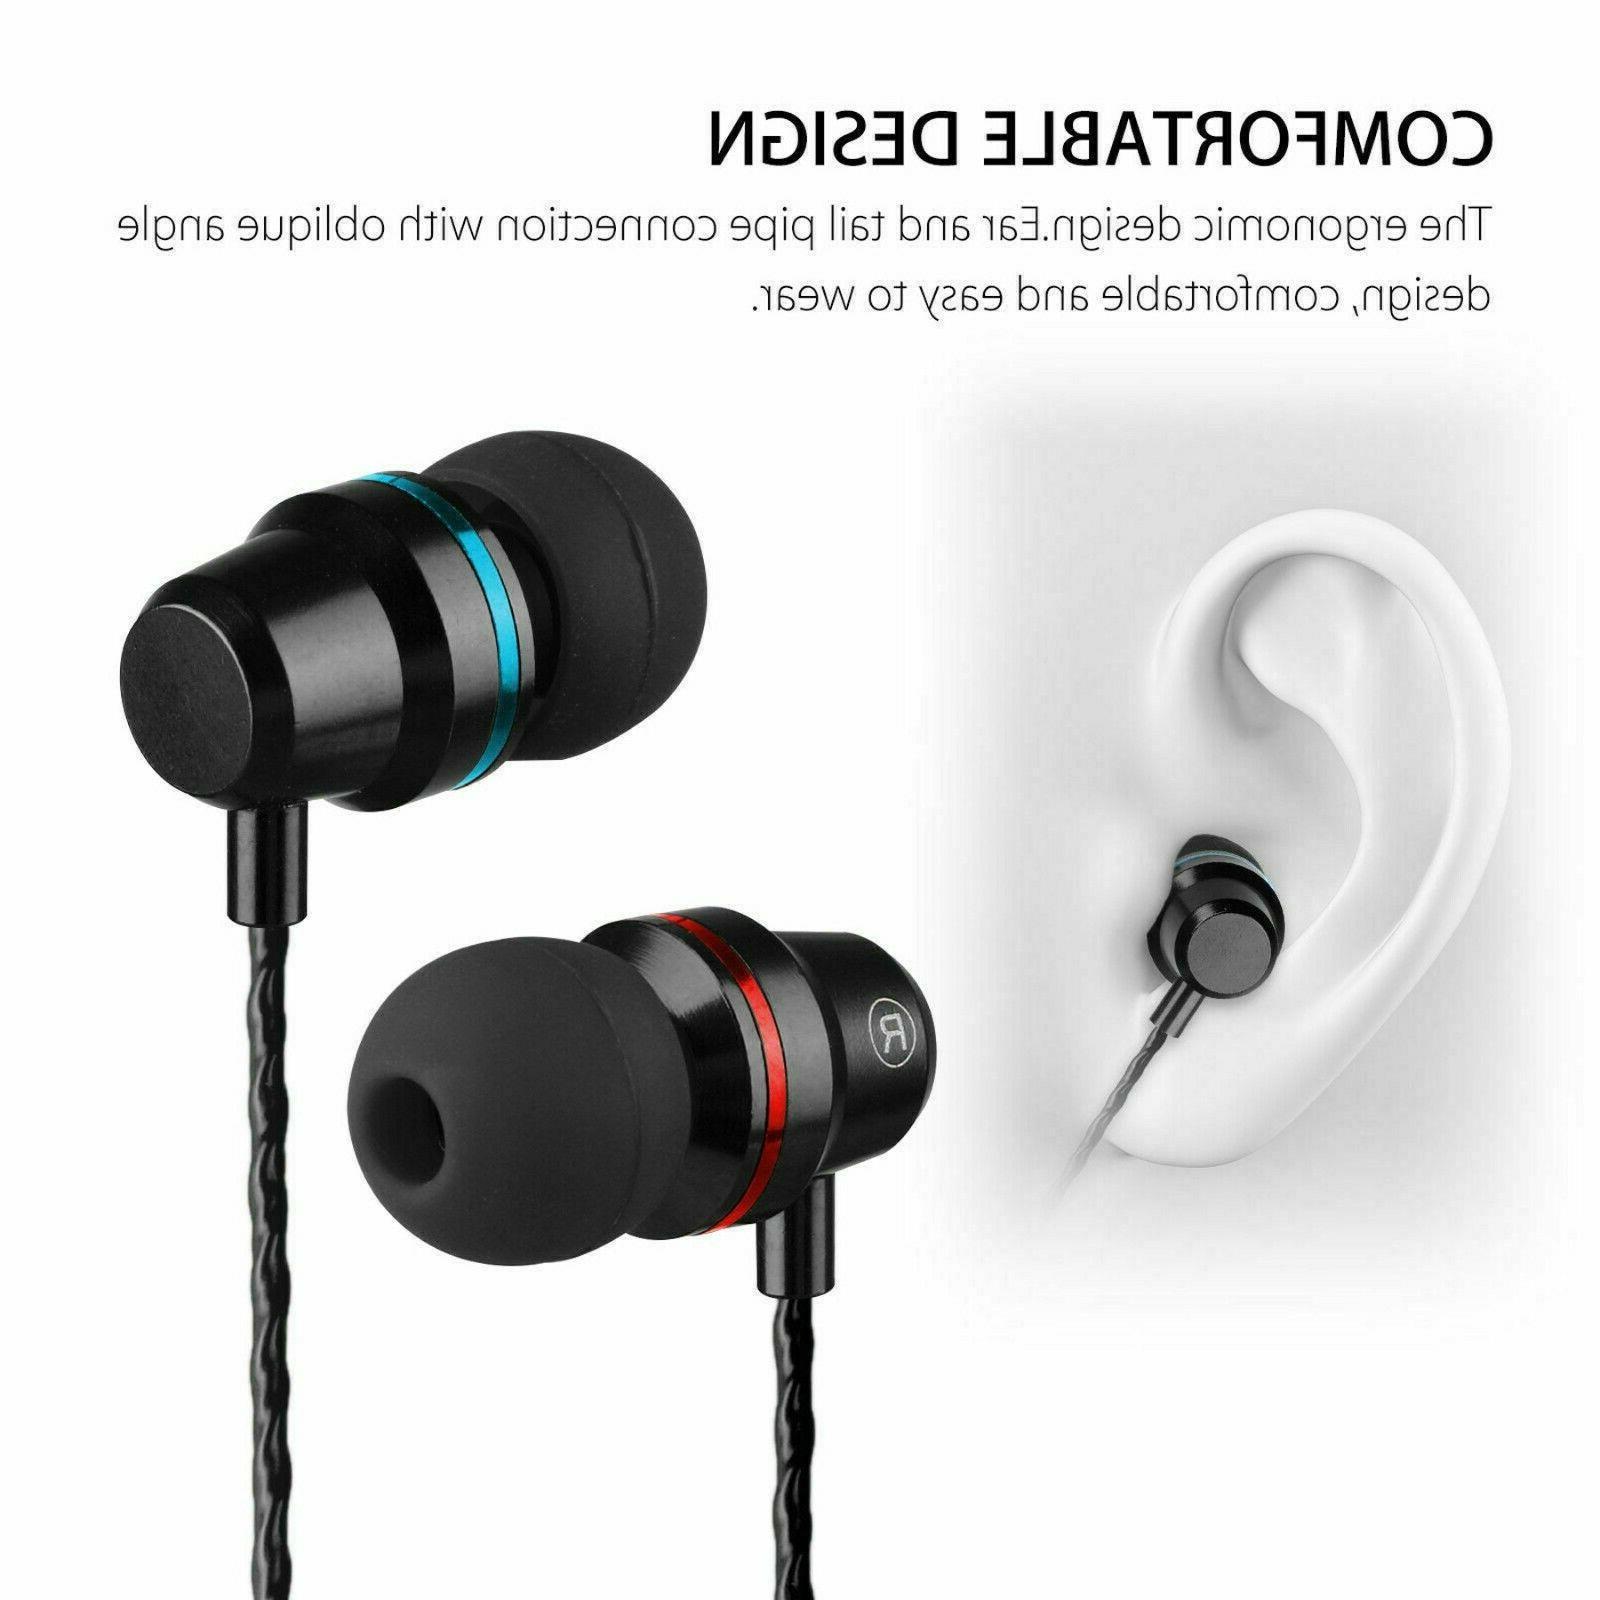 3.5mm Headset Earphone Stereo Earbuds Headphone Wired Mic